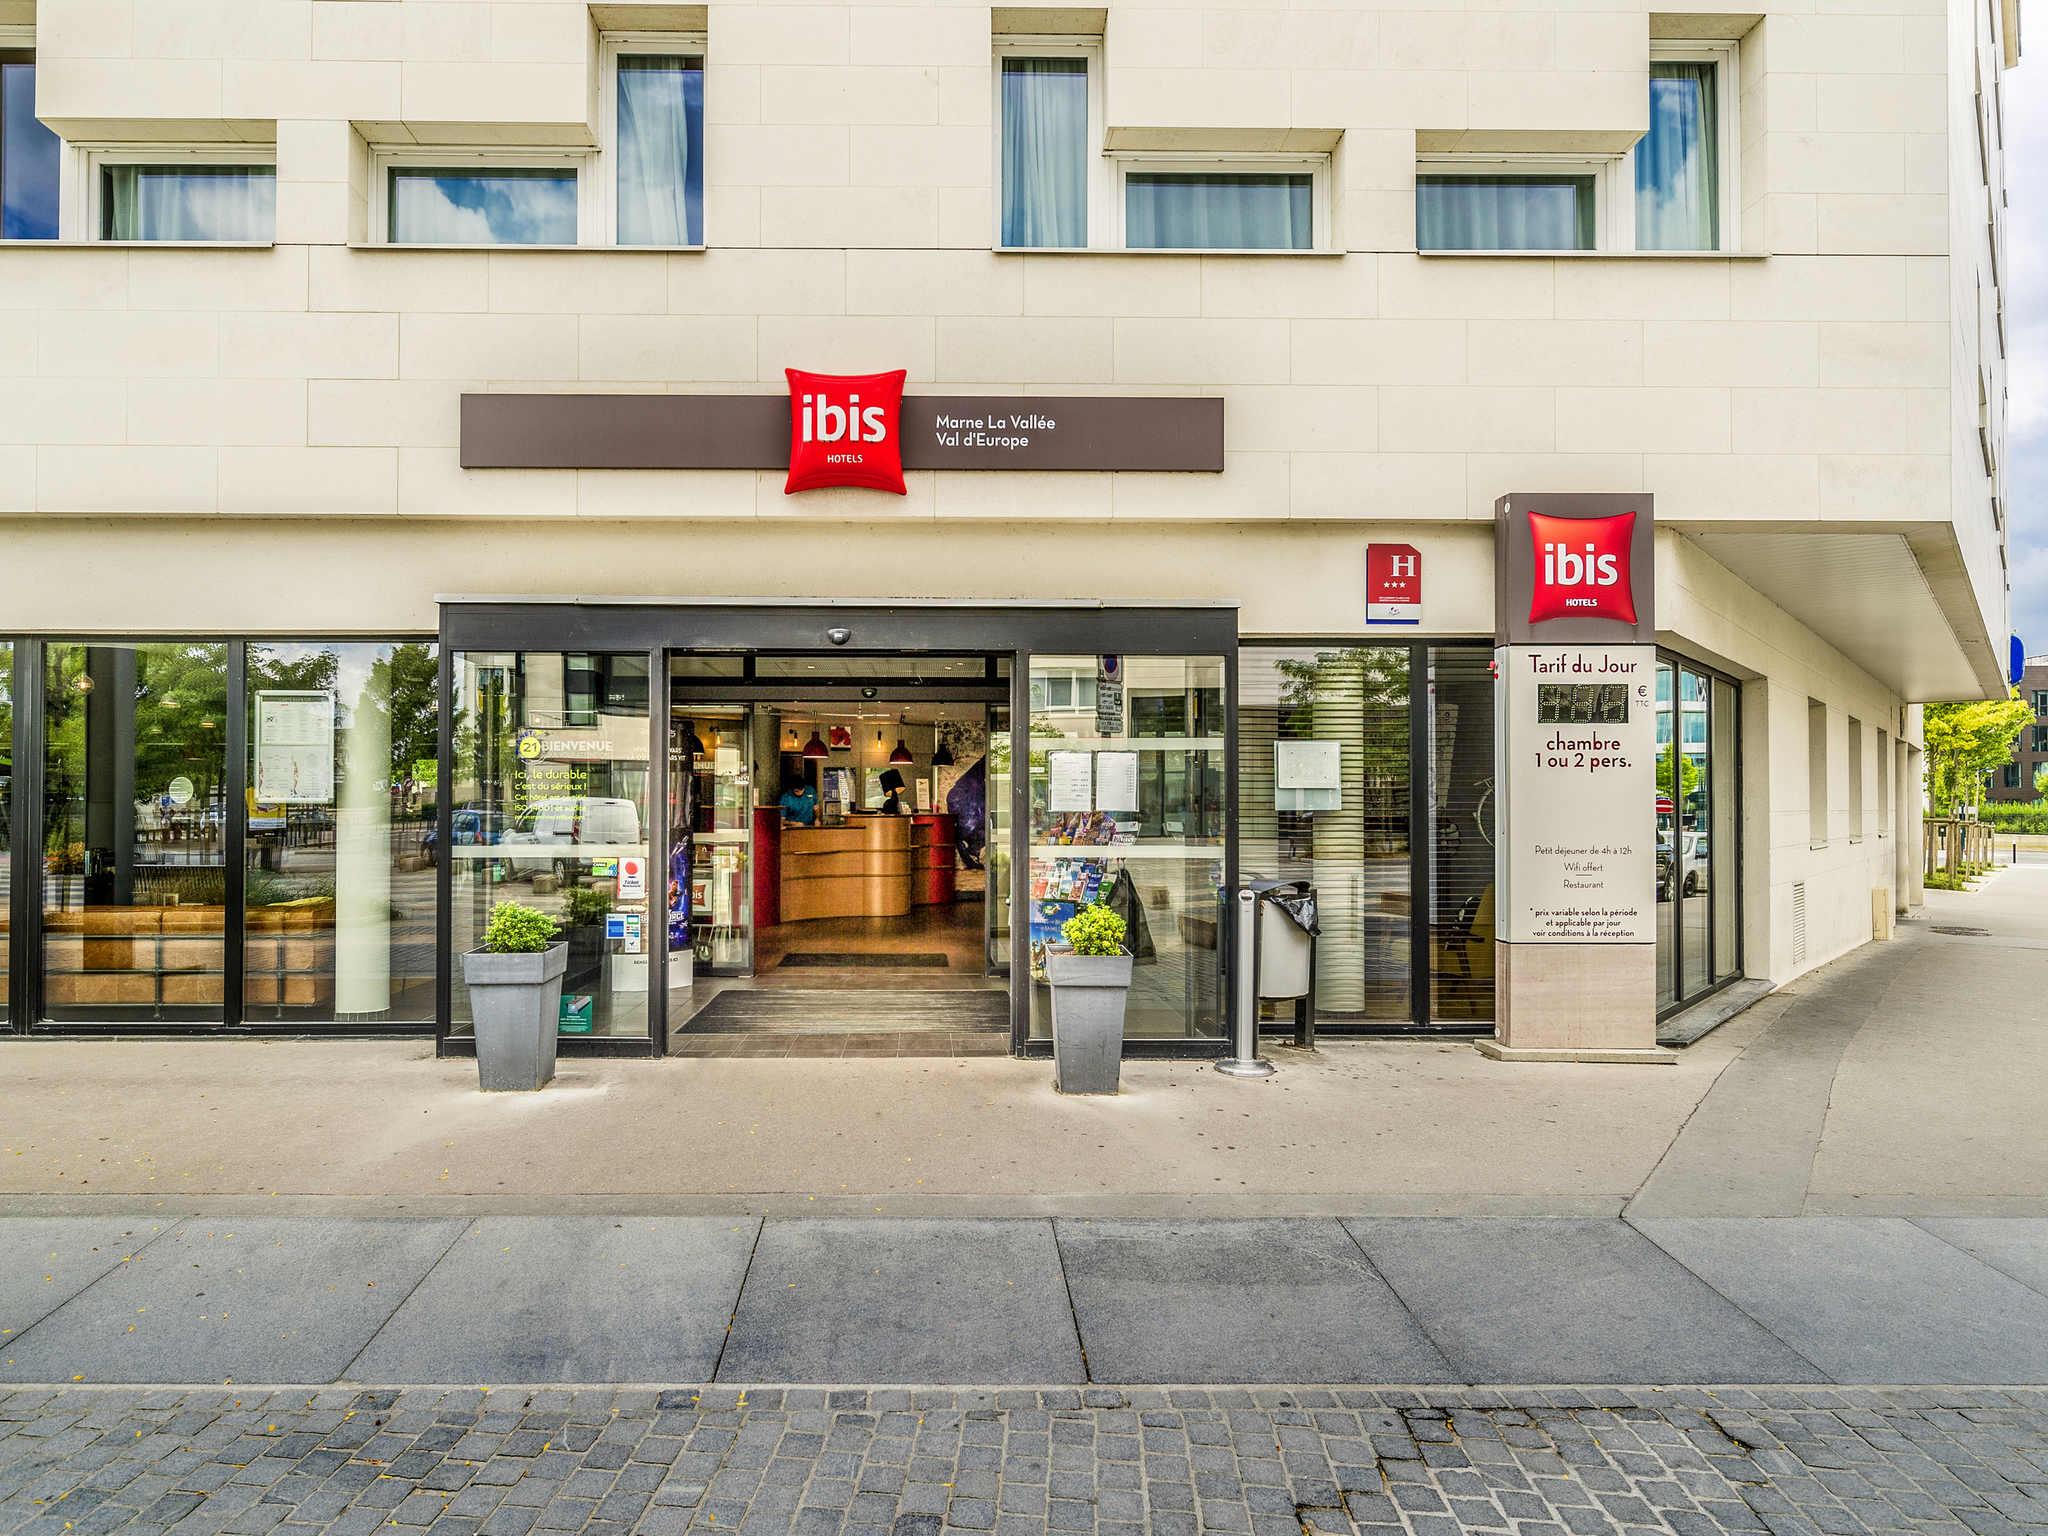 Hotel – ibis Marne la Vallée Val d'Europe